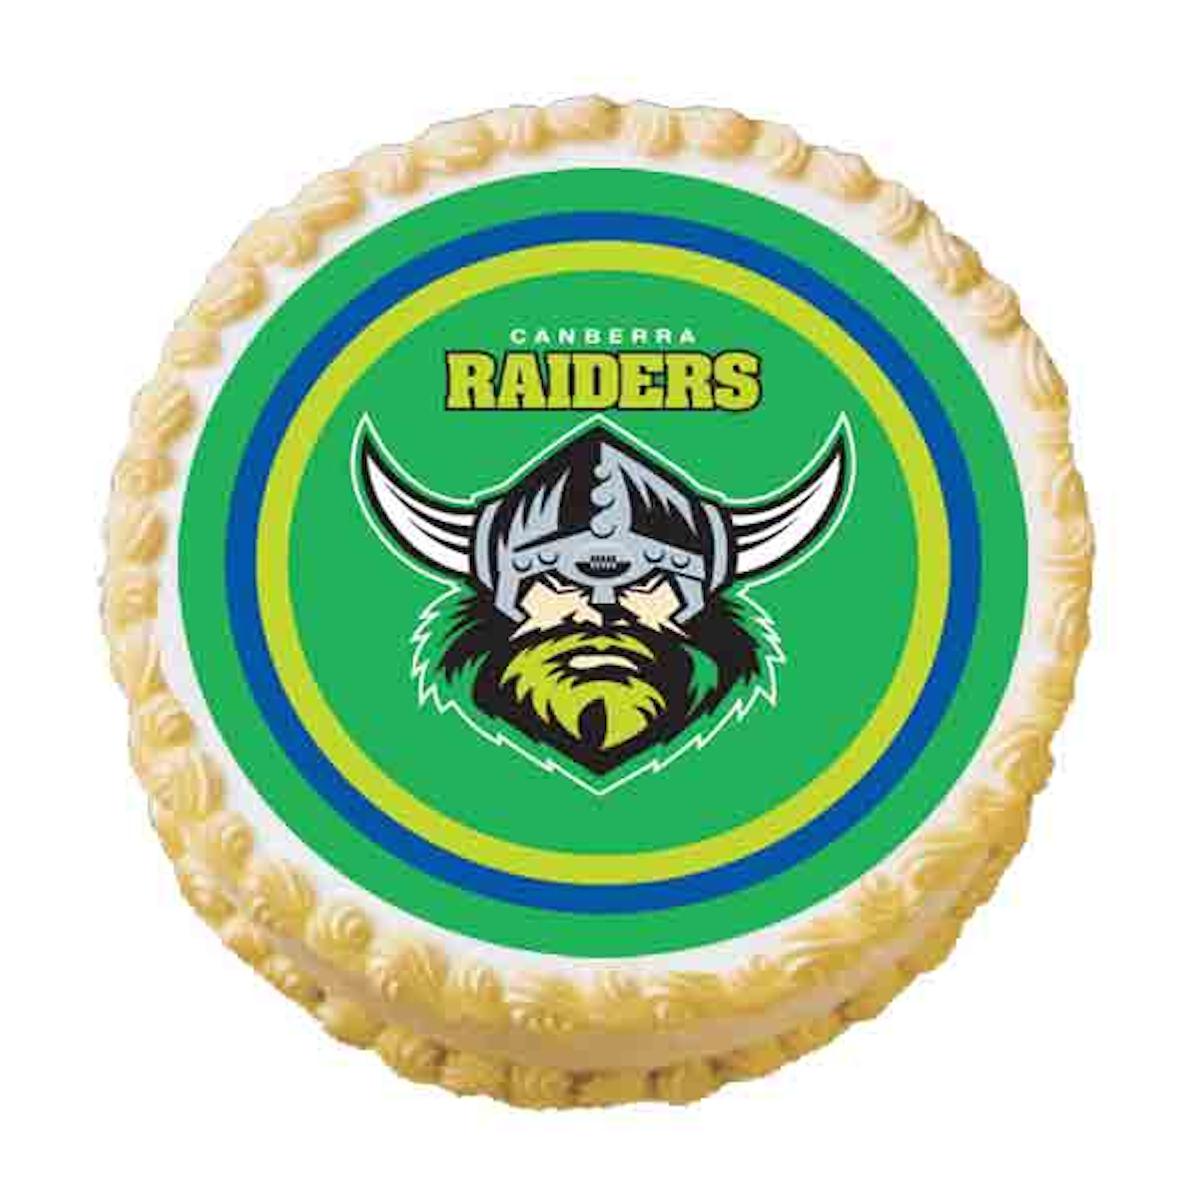 Edible Cake Toppers Brisbane